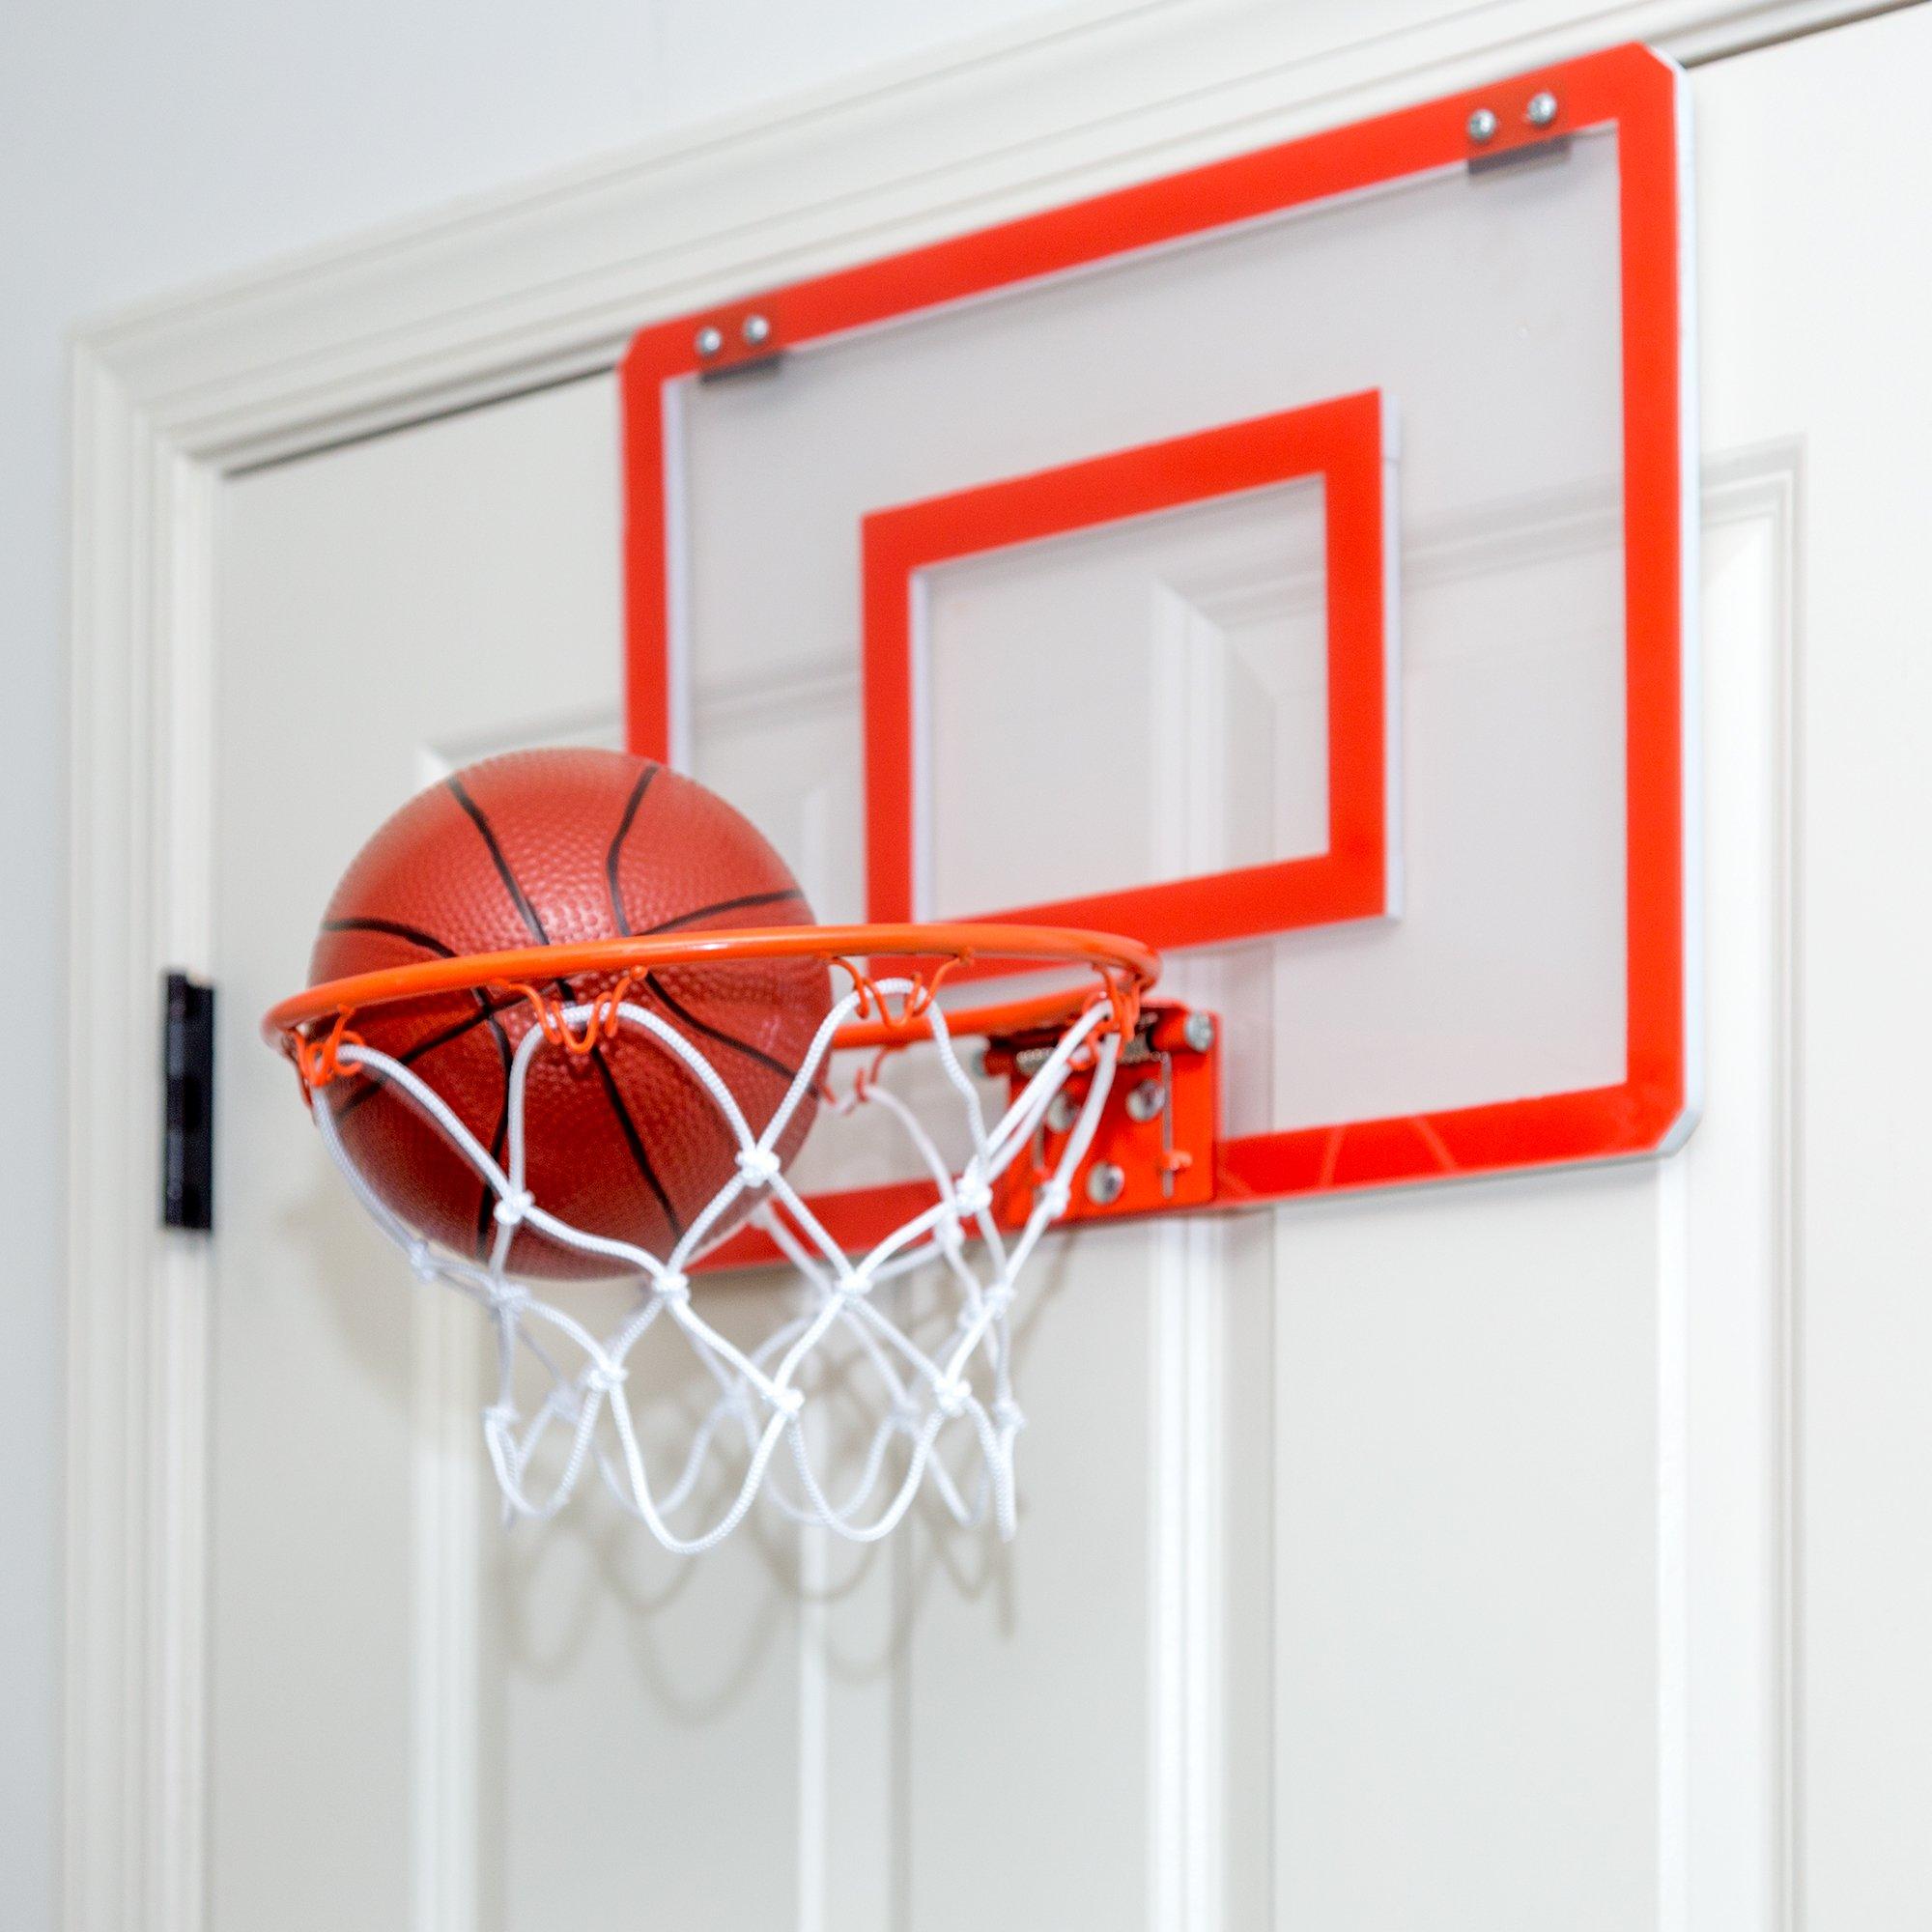 Play Platoon Mini Basketball Hoop for Door - 16 x 12 Inch Bedroom Basketball Hoop Indoors Set by Play Platoon (Image #3)